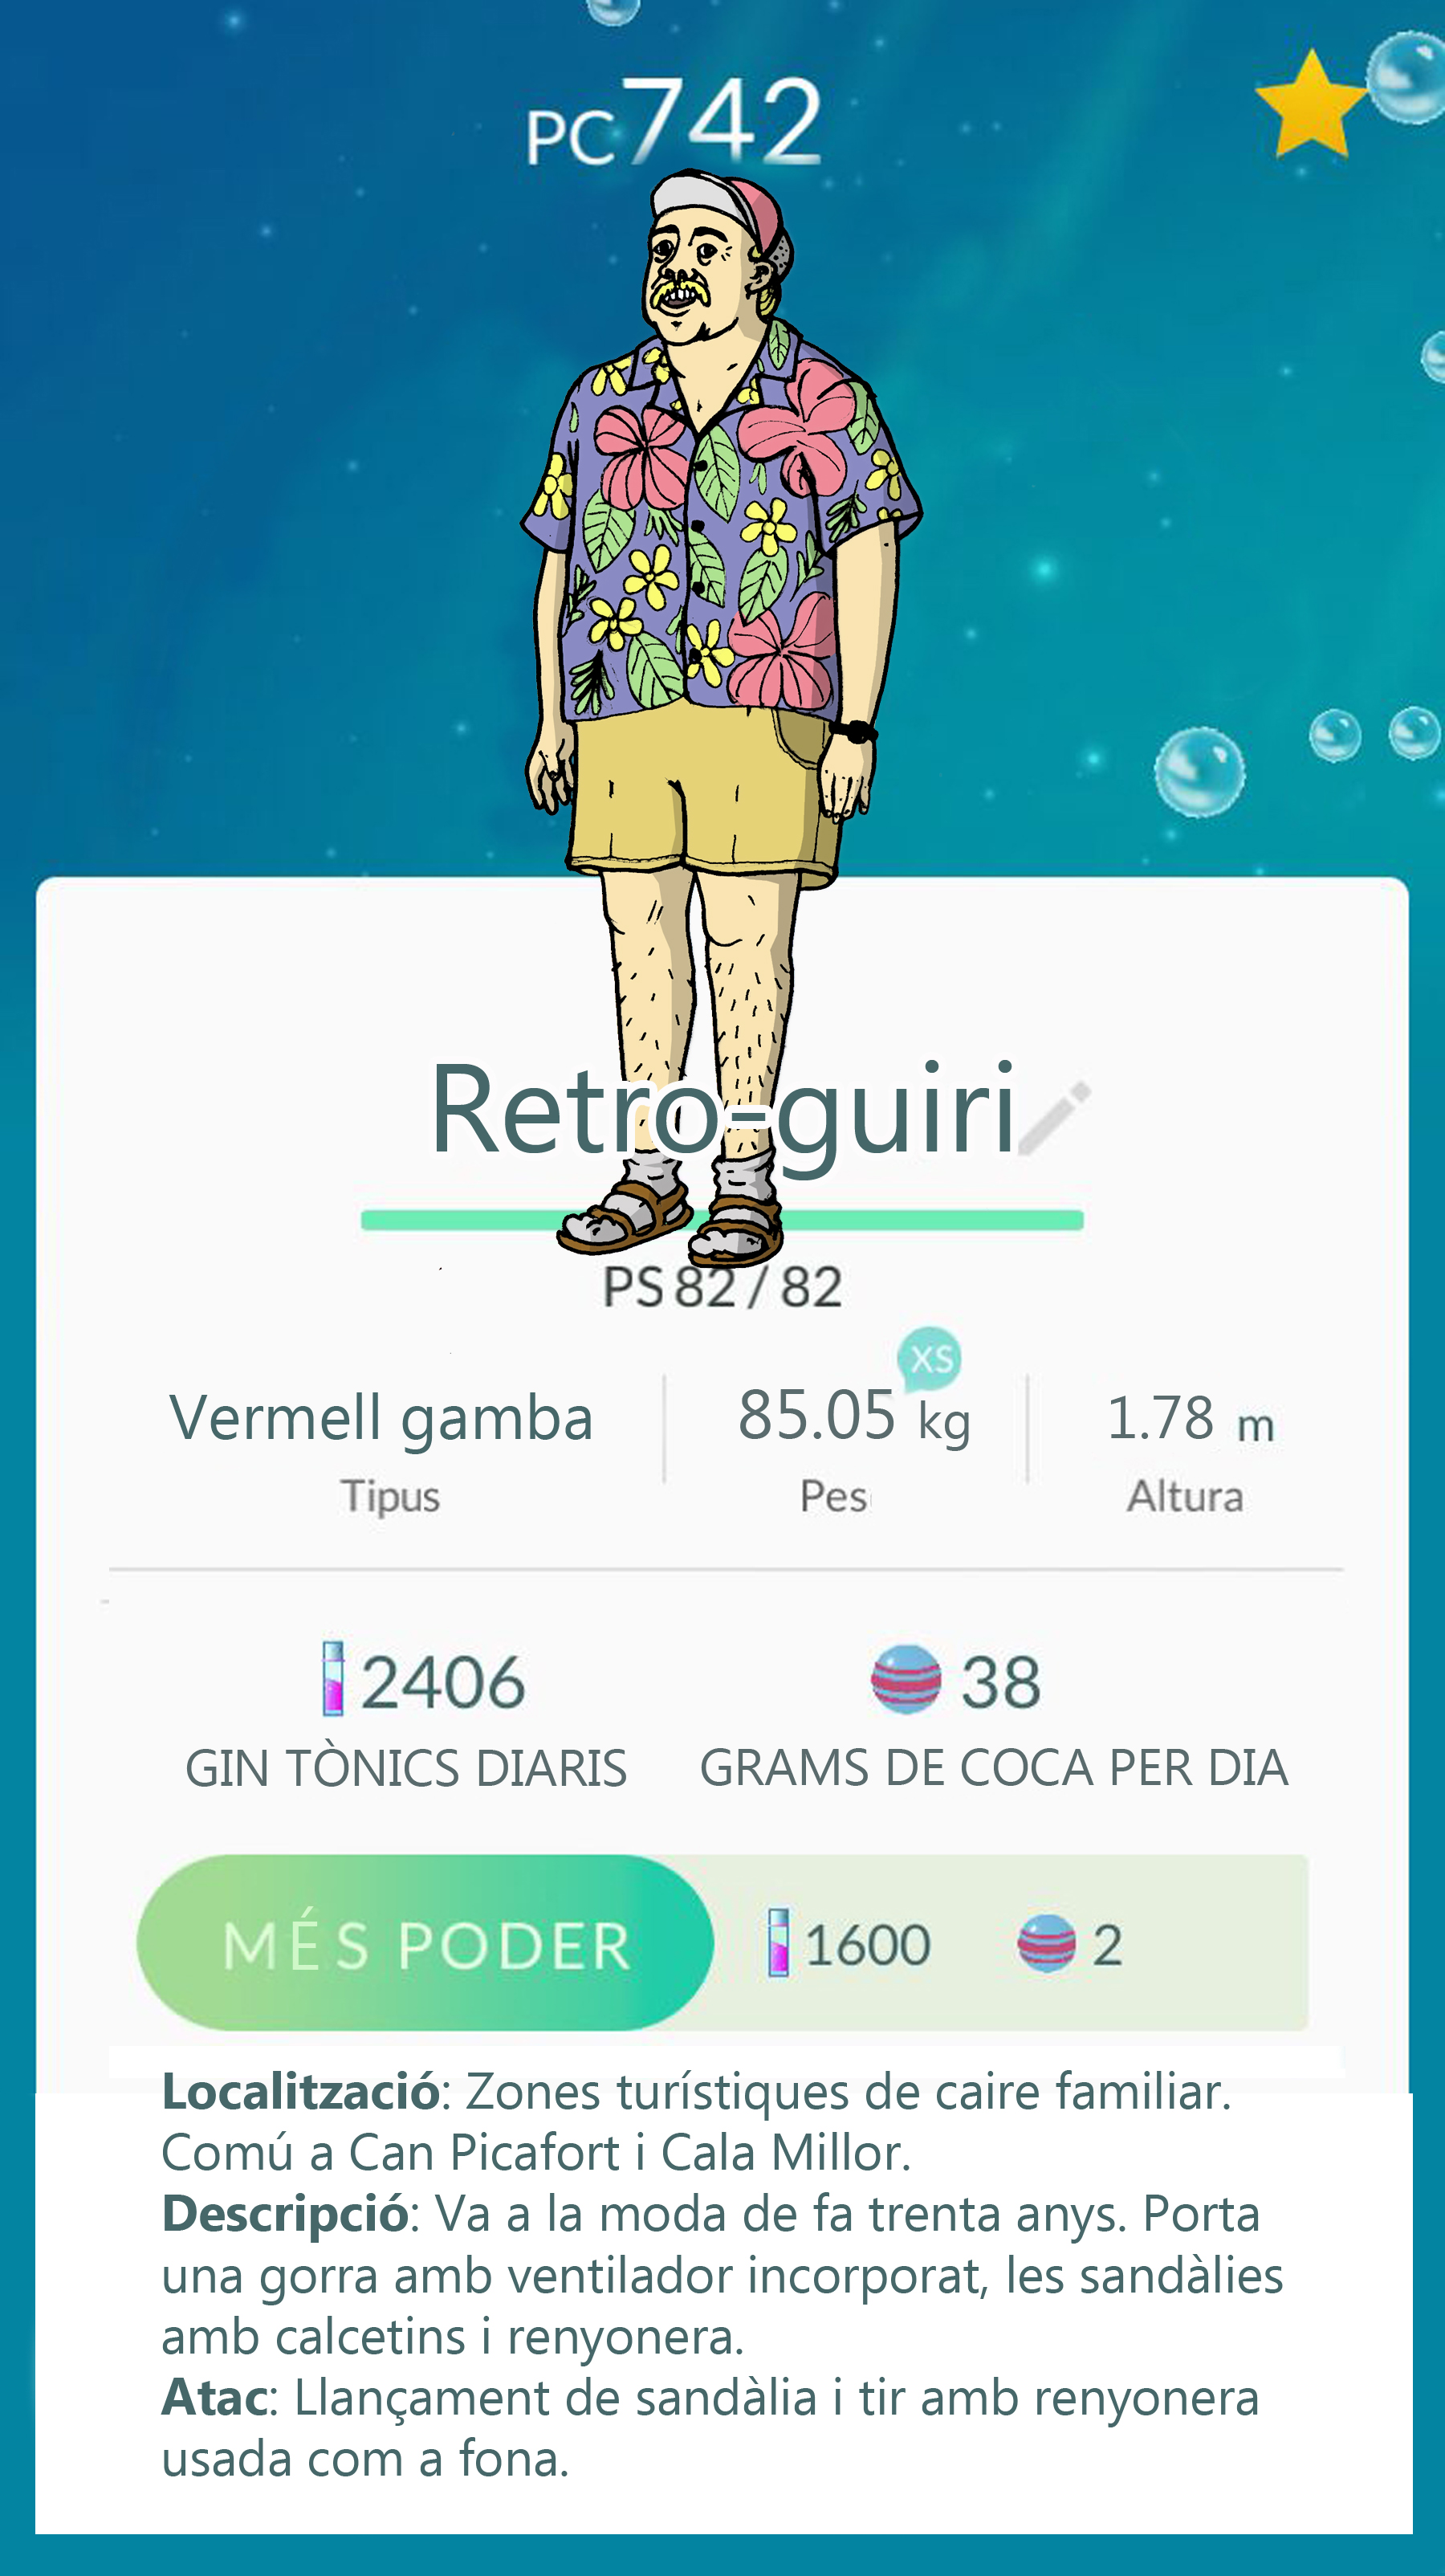 El Retro Guiri